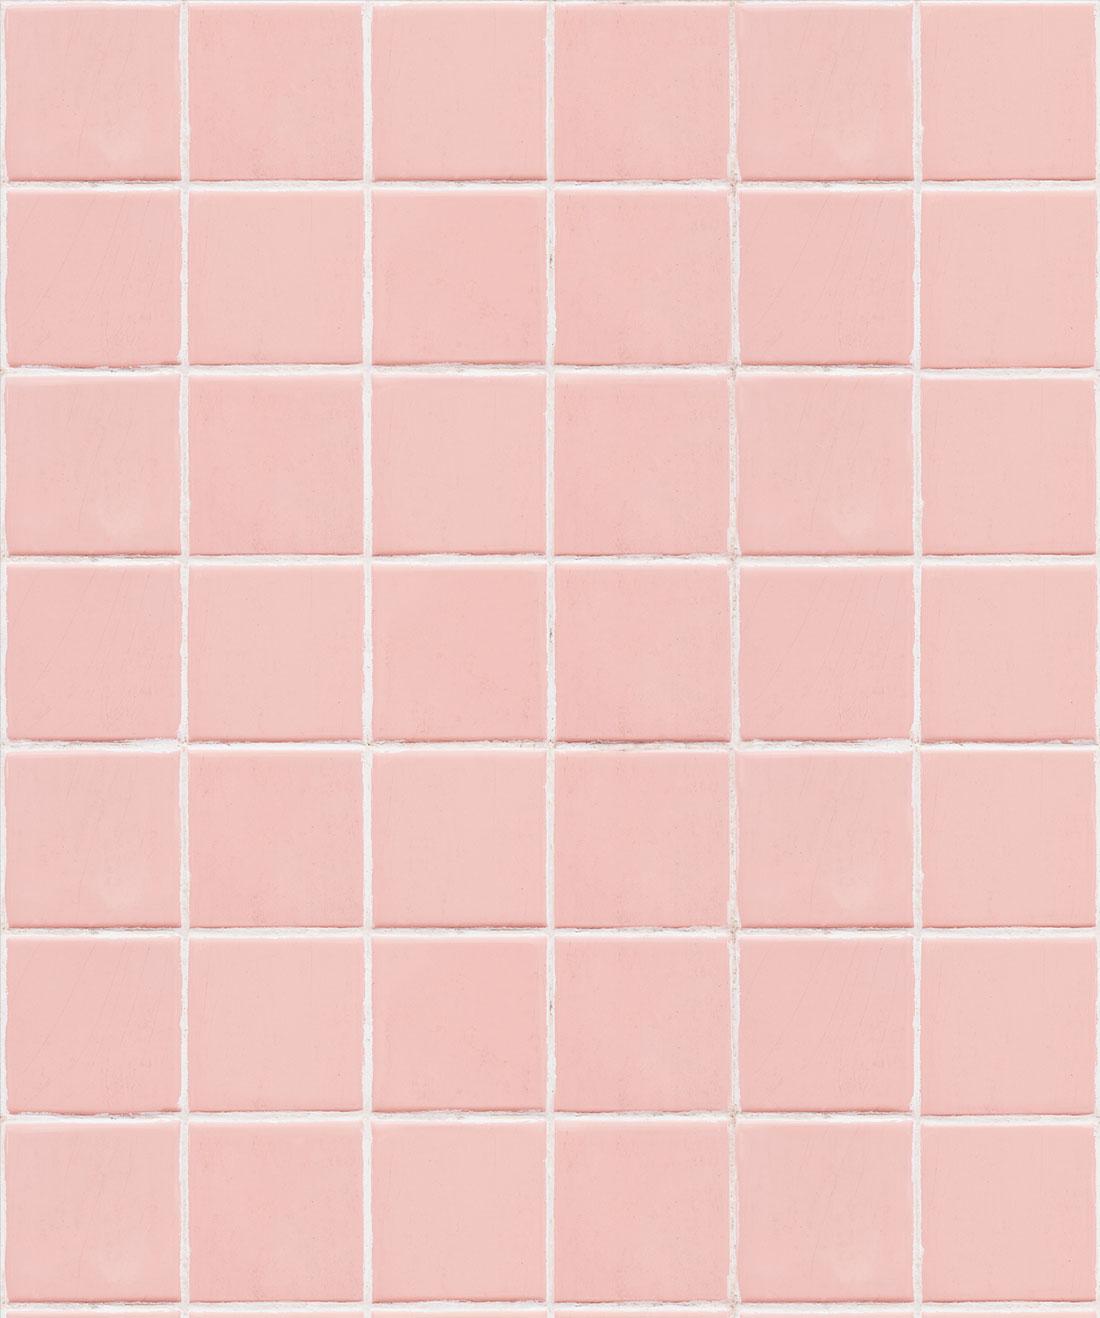 Design Your Own Kitchen Tiles